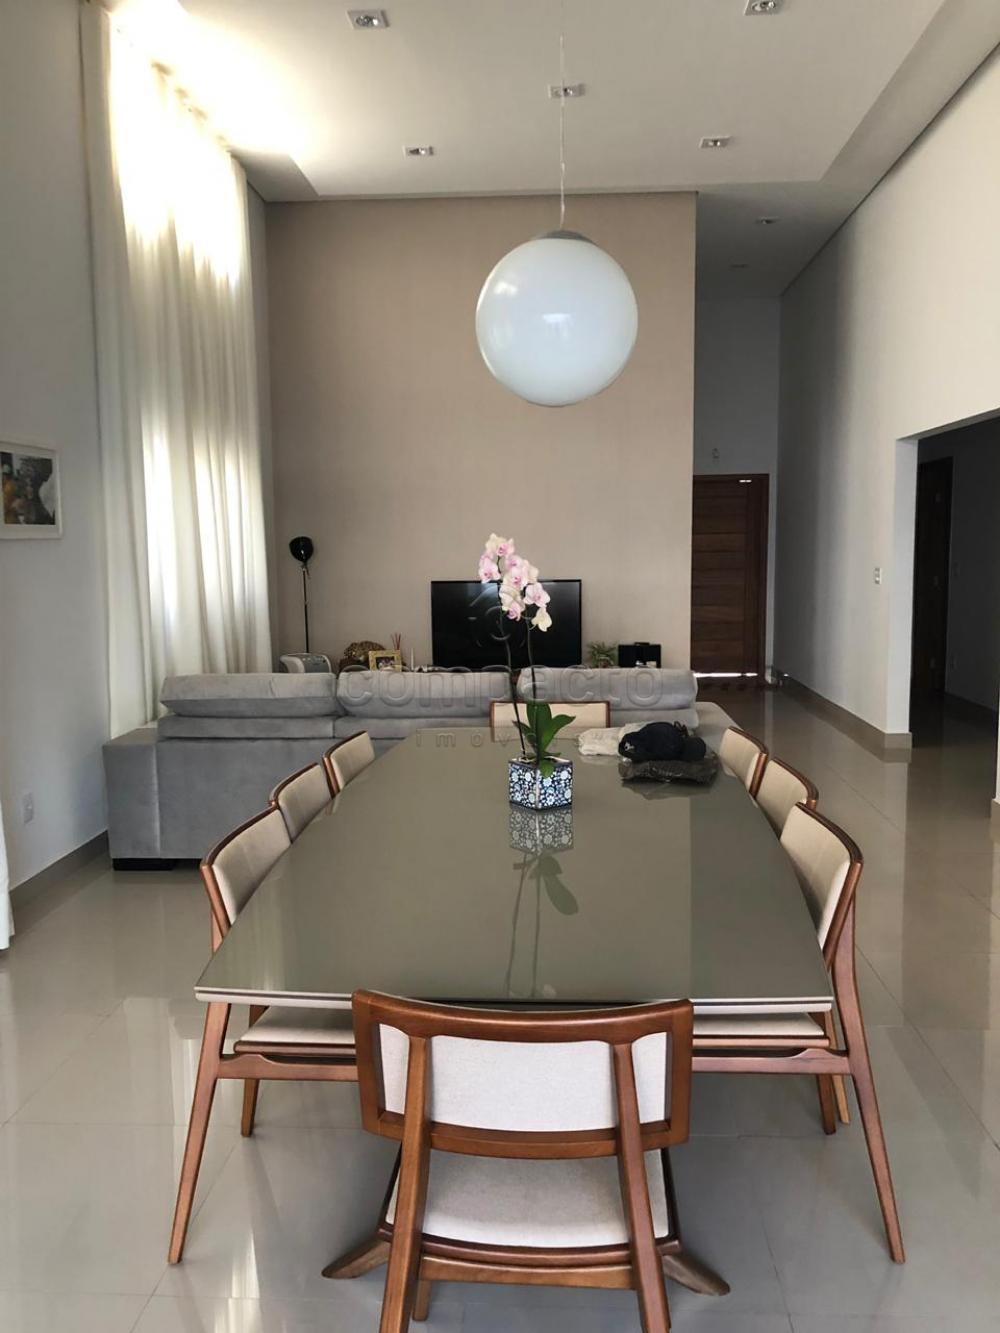 Comprar Casa / Condomínio em Bauru apenas R$ 850.000,00 - Foto 3